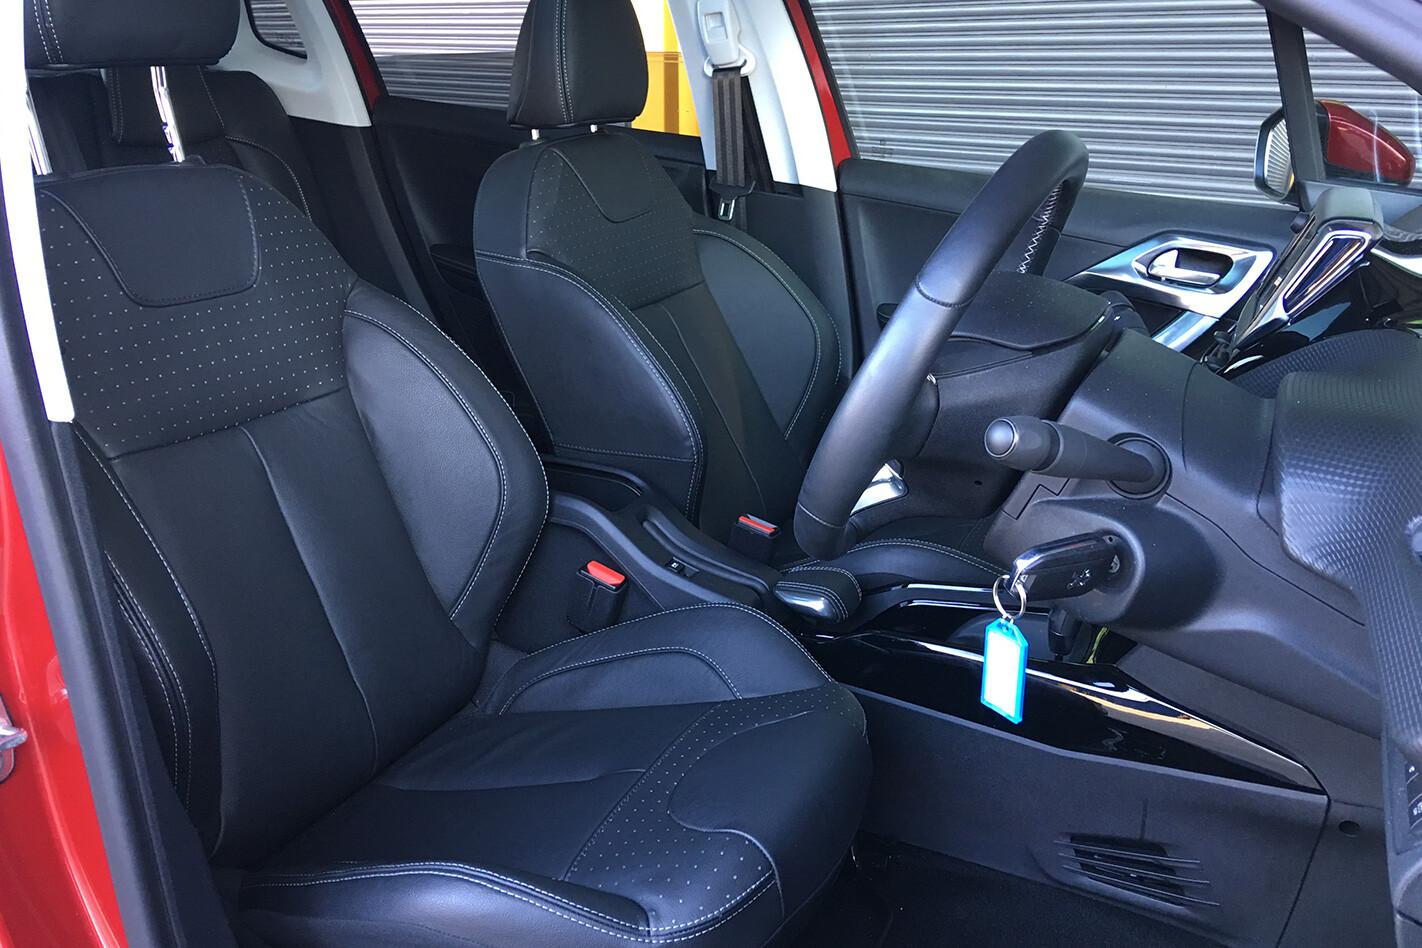 Peugeot 2008 Seats Jpg